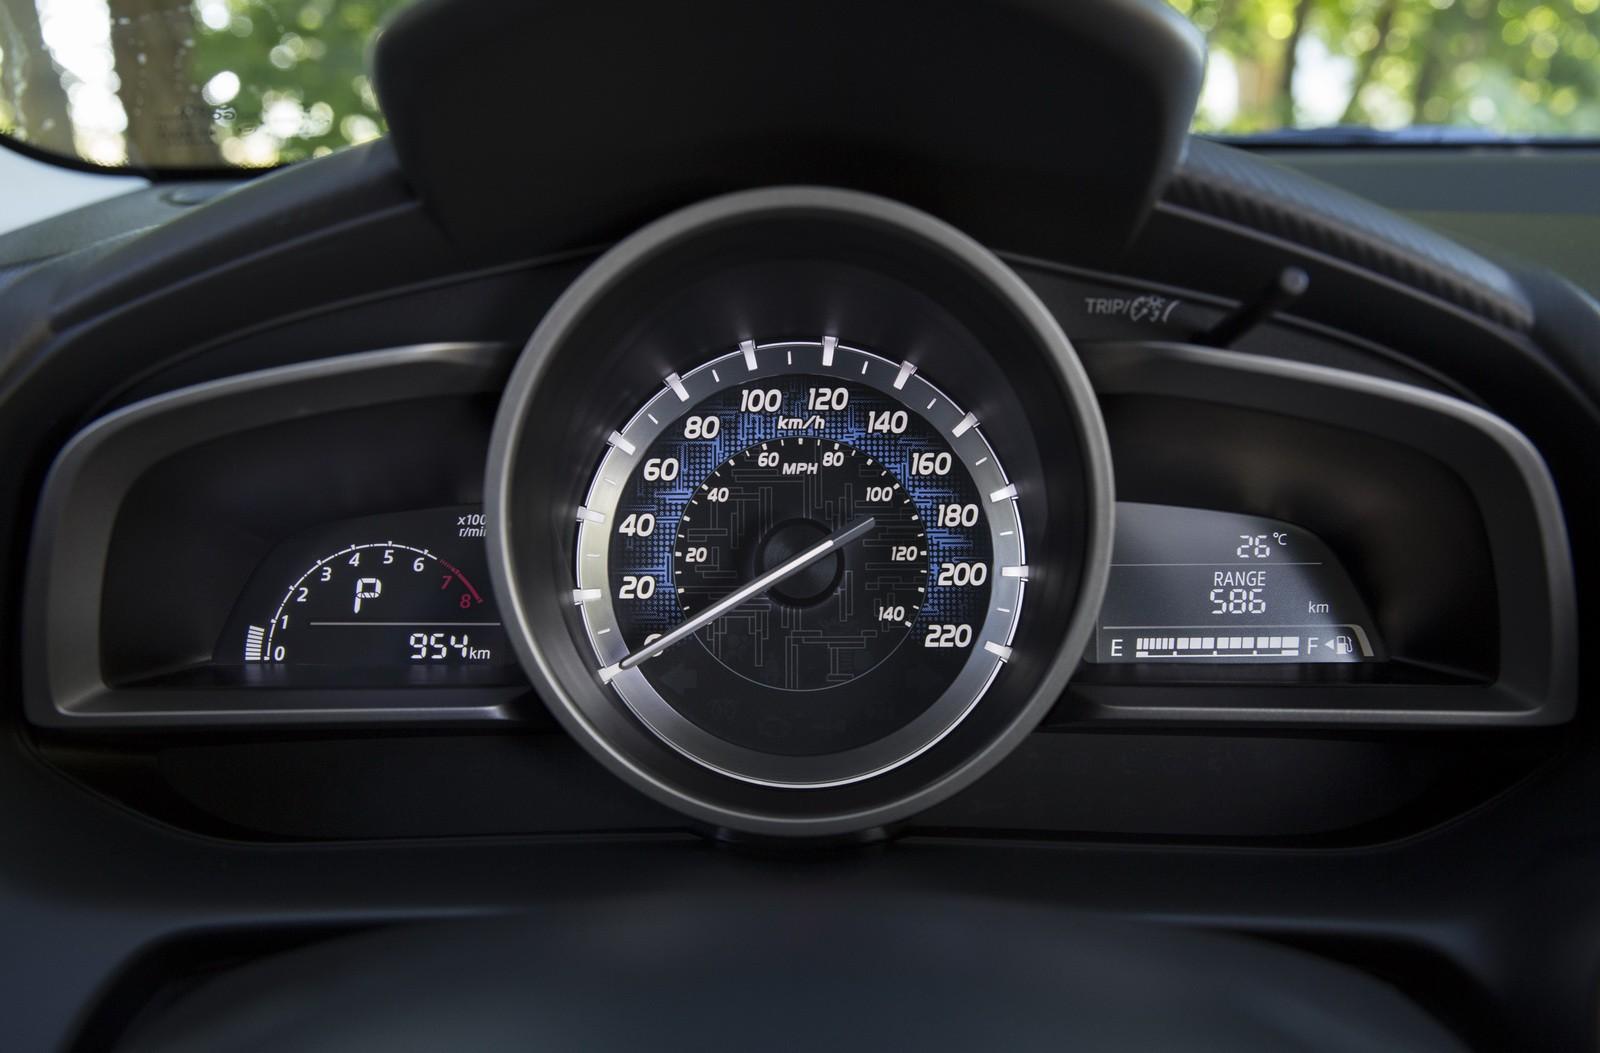 Toyota echo dashboard symbols gallery symbol and sign ideas 2016 toyota yaris sedan replaces the scion ia is still a mazda2 2016 toyota yaris sedan buycottarizona